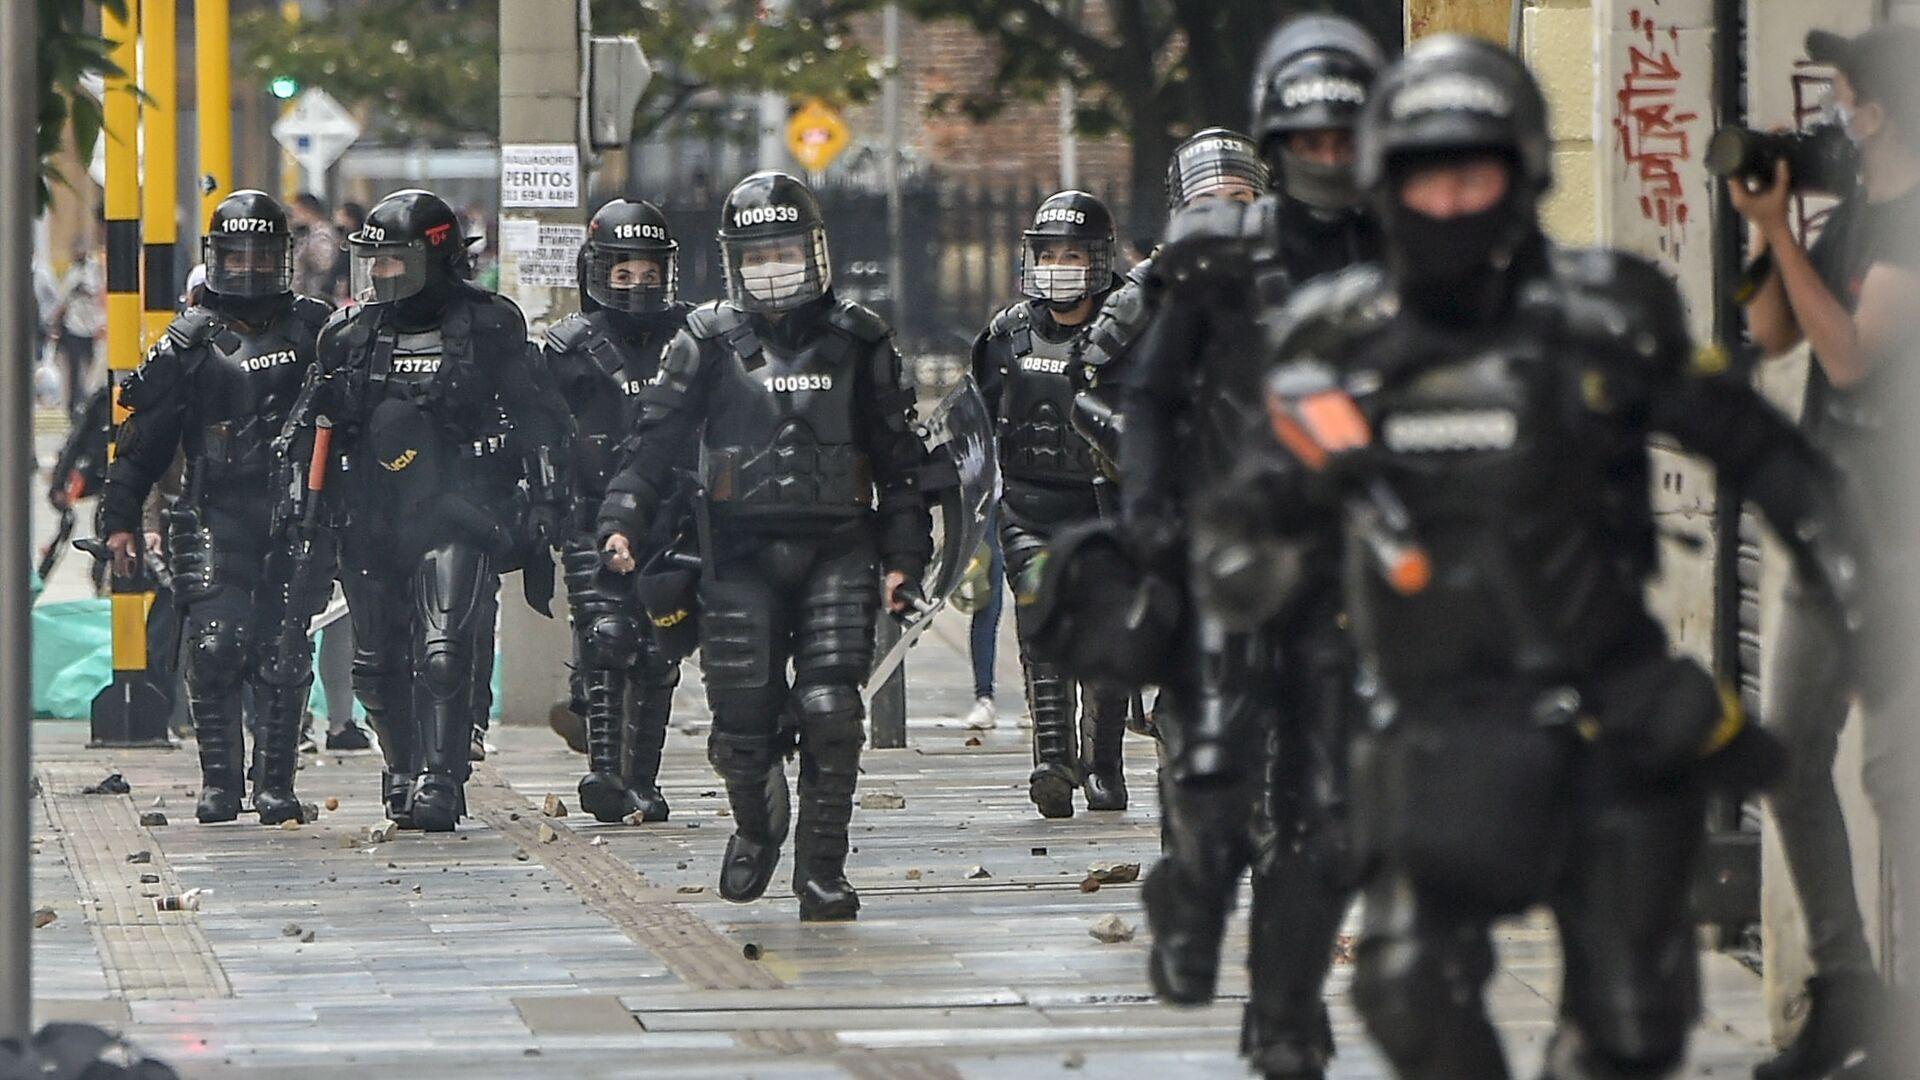 Policía antidisturbios en Bogotá, Colombia - Sputnik Mundo, 1920, 06.08.2021